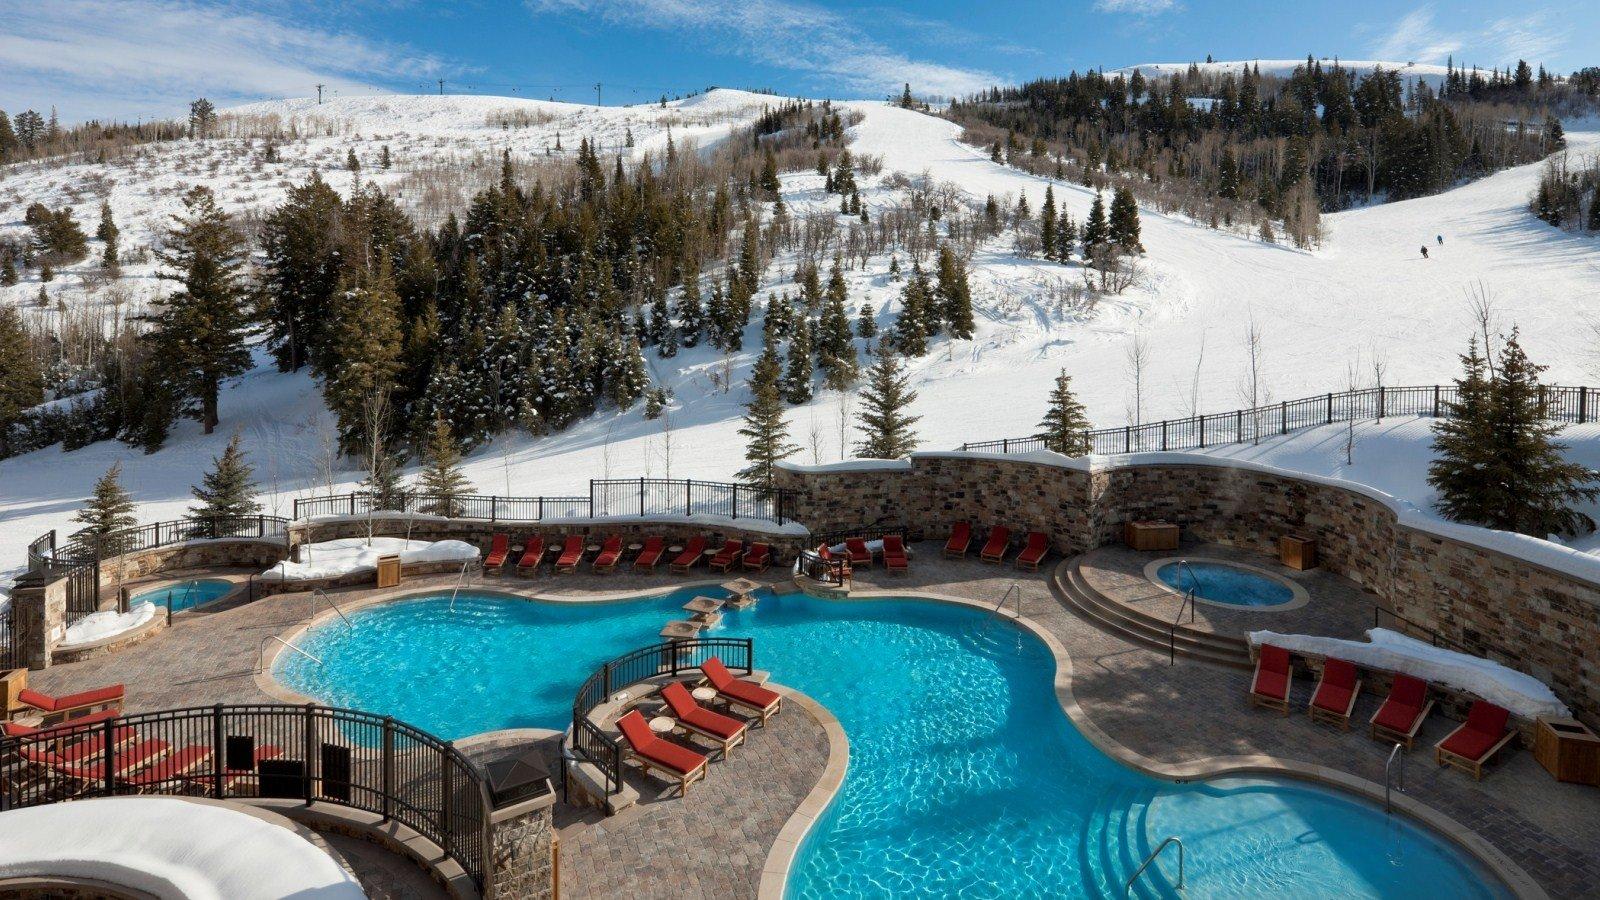 Trip Ideas outdoor snow sky leisure Resort outdoor recreation recreation park piste amusement park lined several